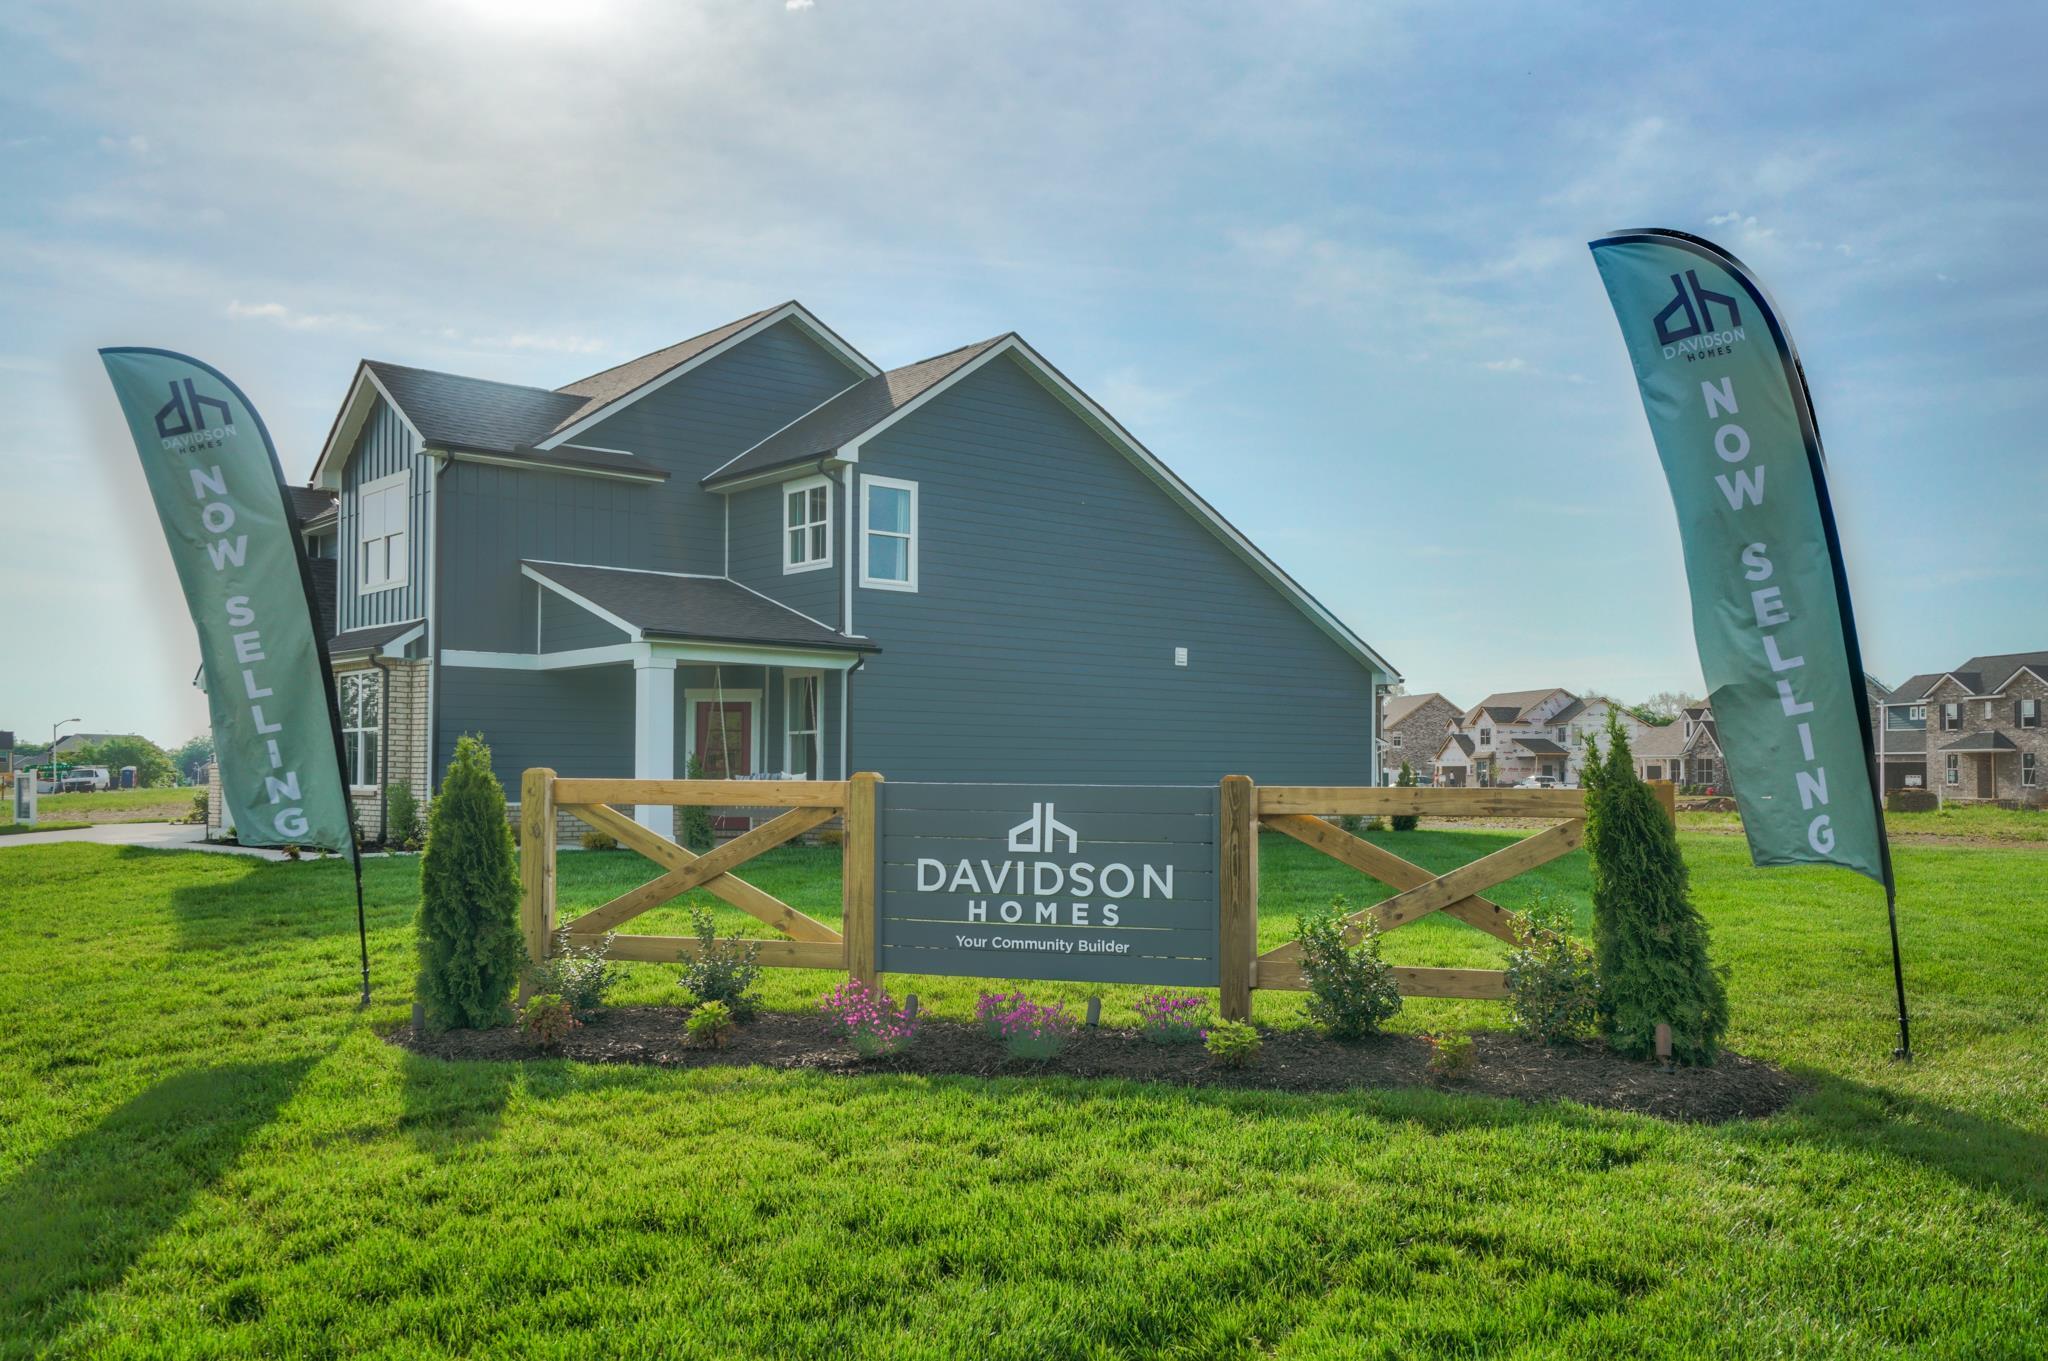 2531 Kingfisher Drive(Lot 61), Murfreesboro, TN 37128 - Murfreesboro, TN real estate listing